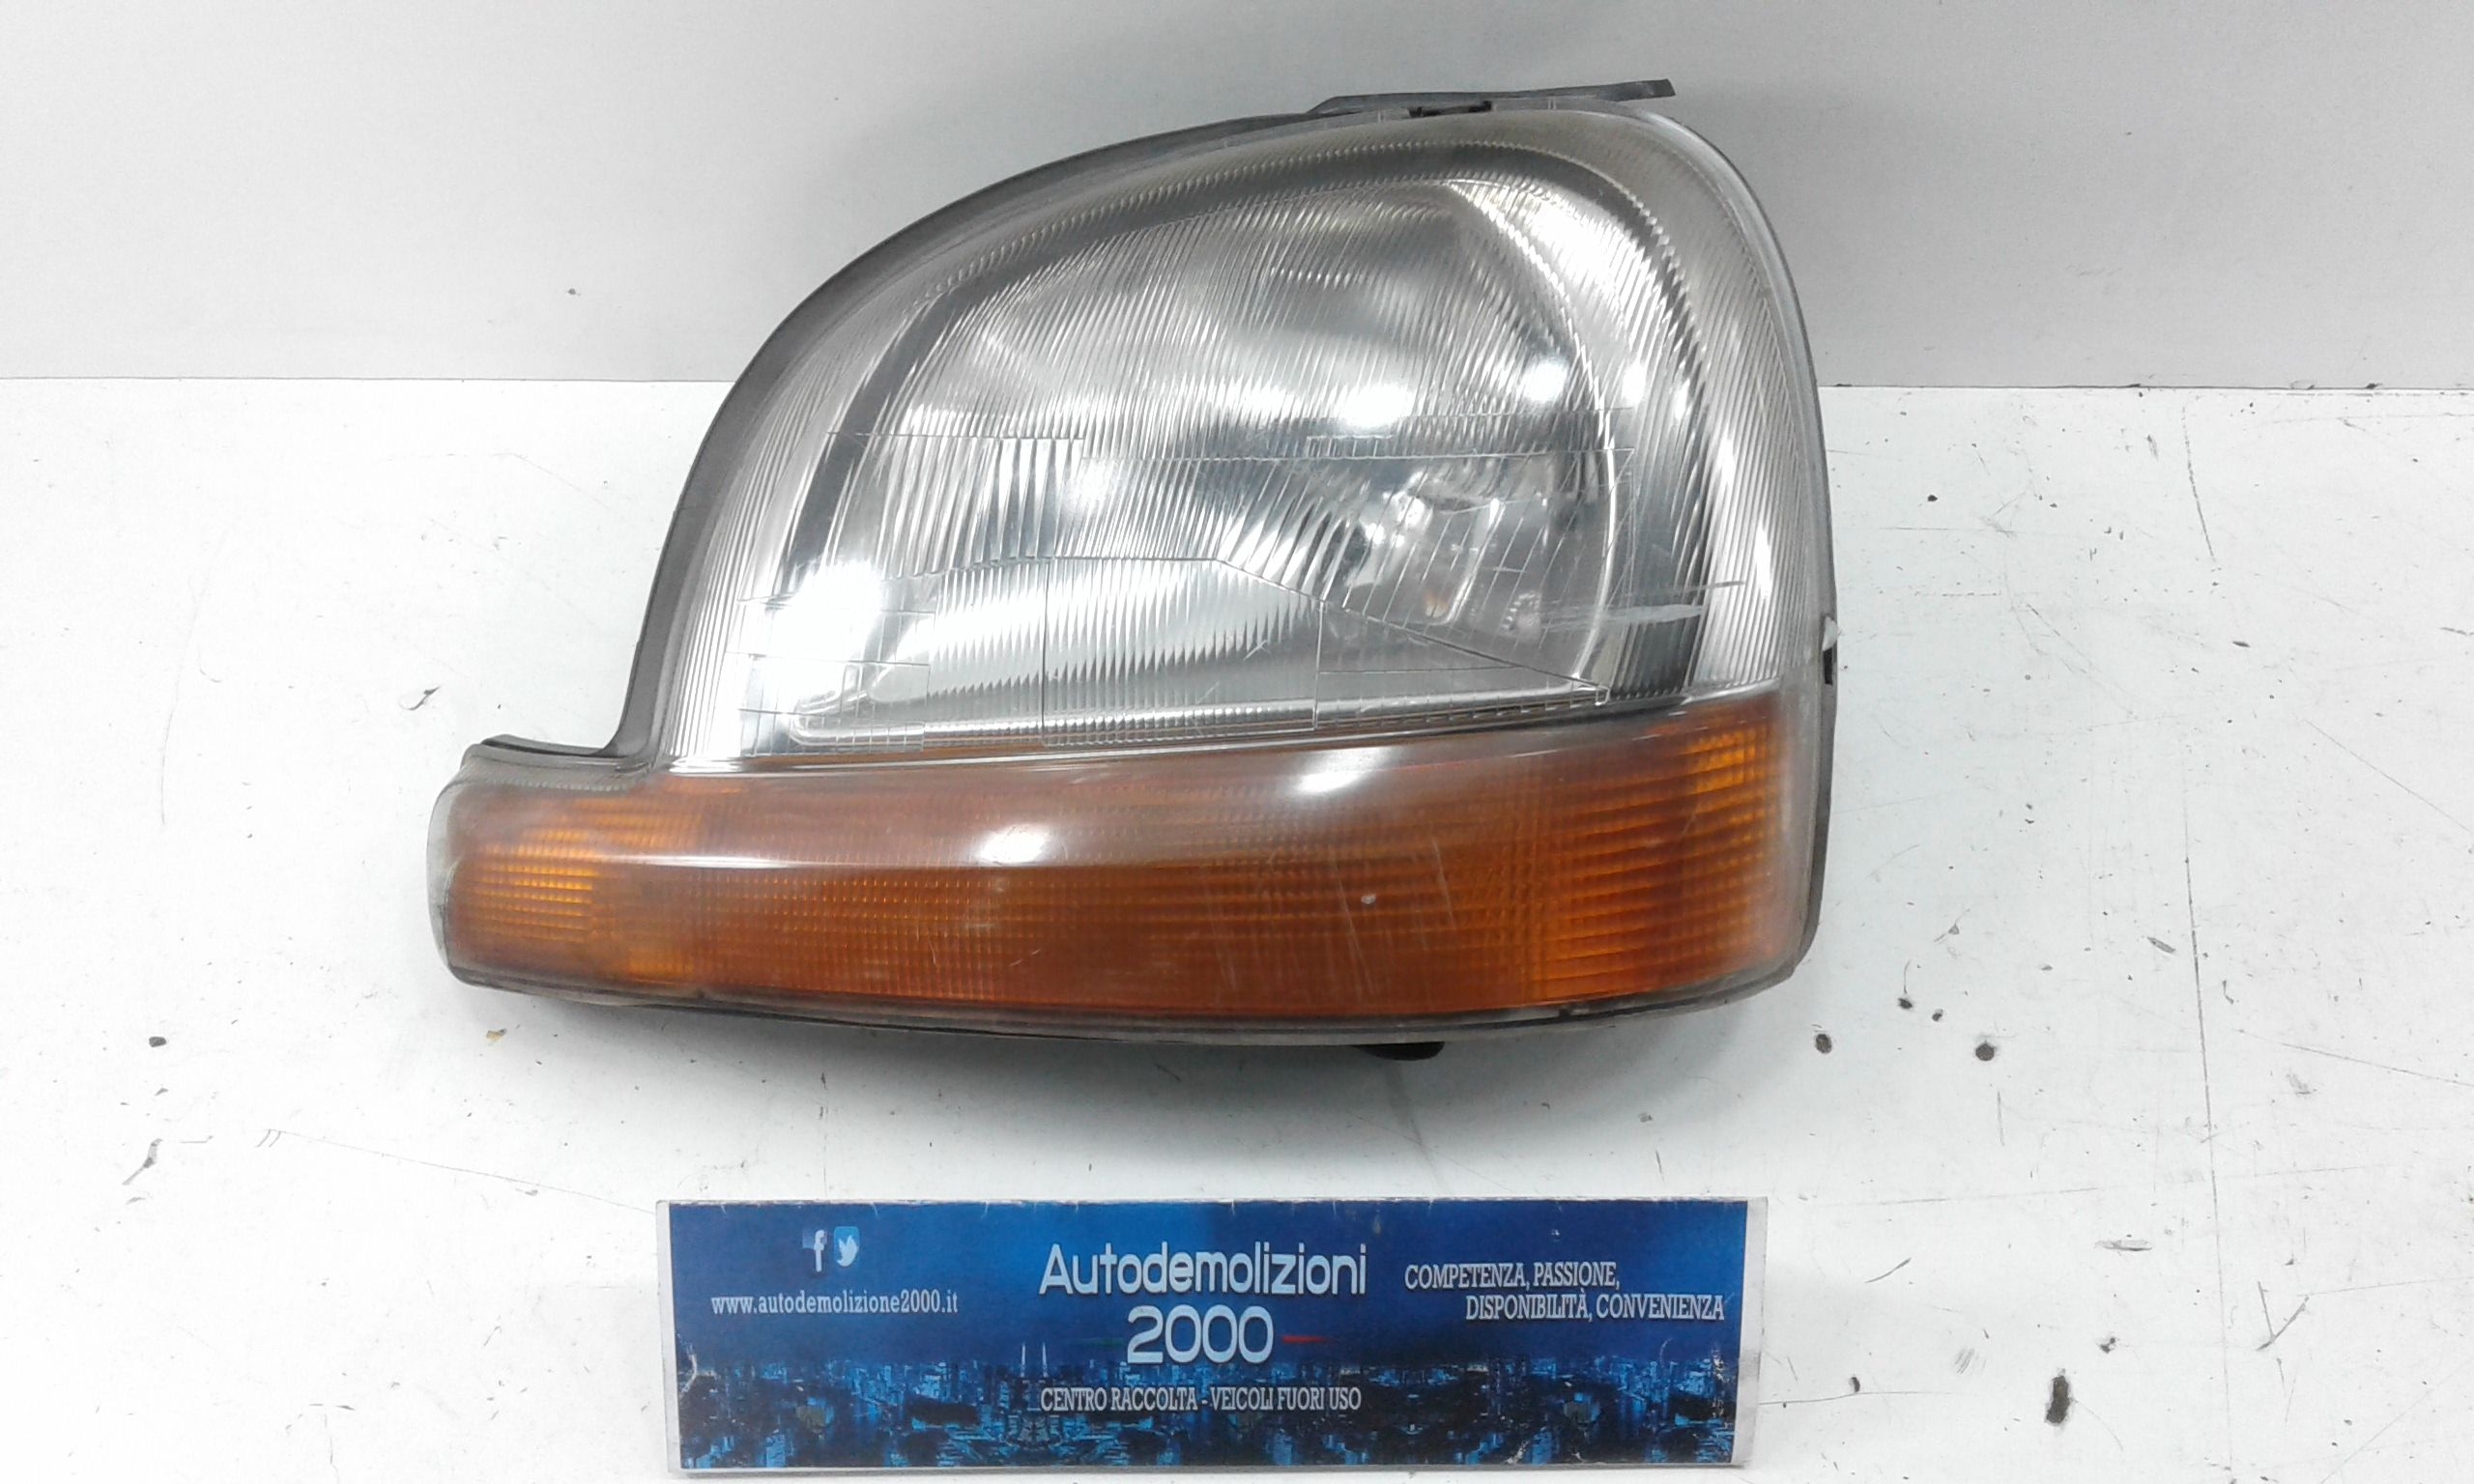 FARO ANTERIORE SINISTRO GUIDA RENAULT Kangoo 1° Serie Benzina  (2000) RICAMBI USATI